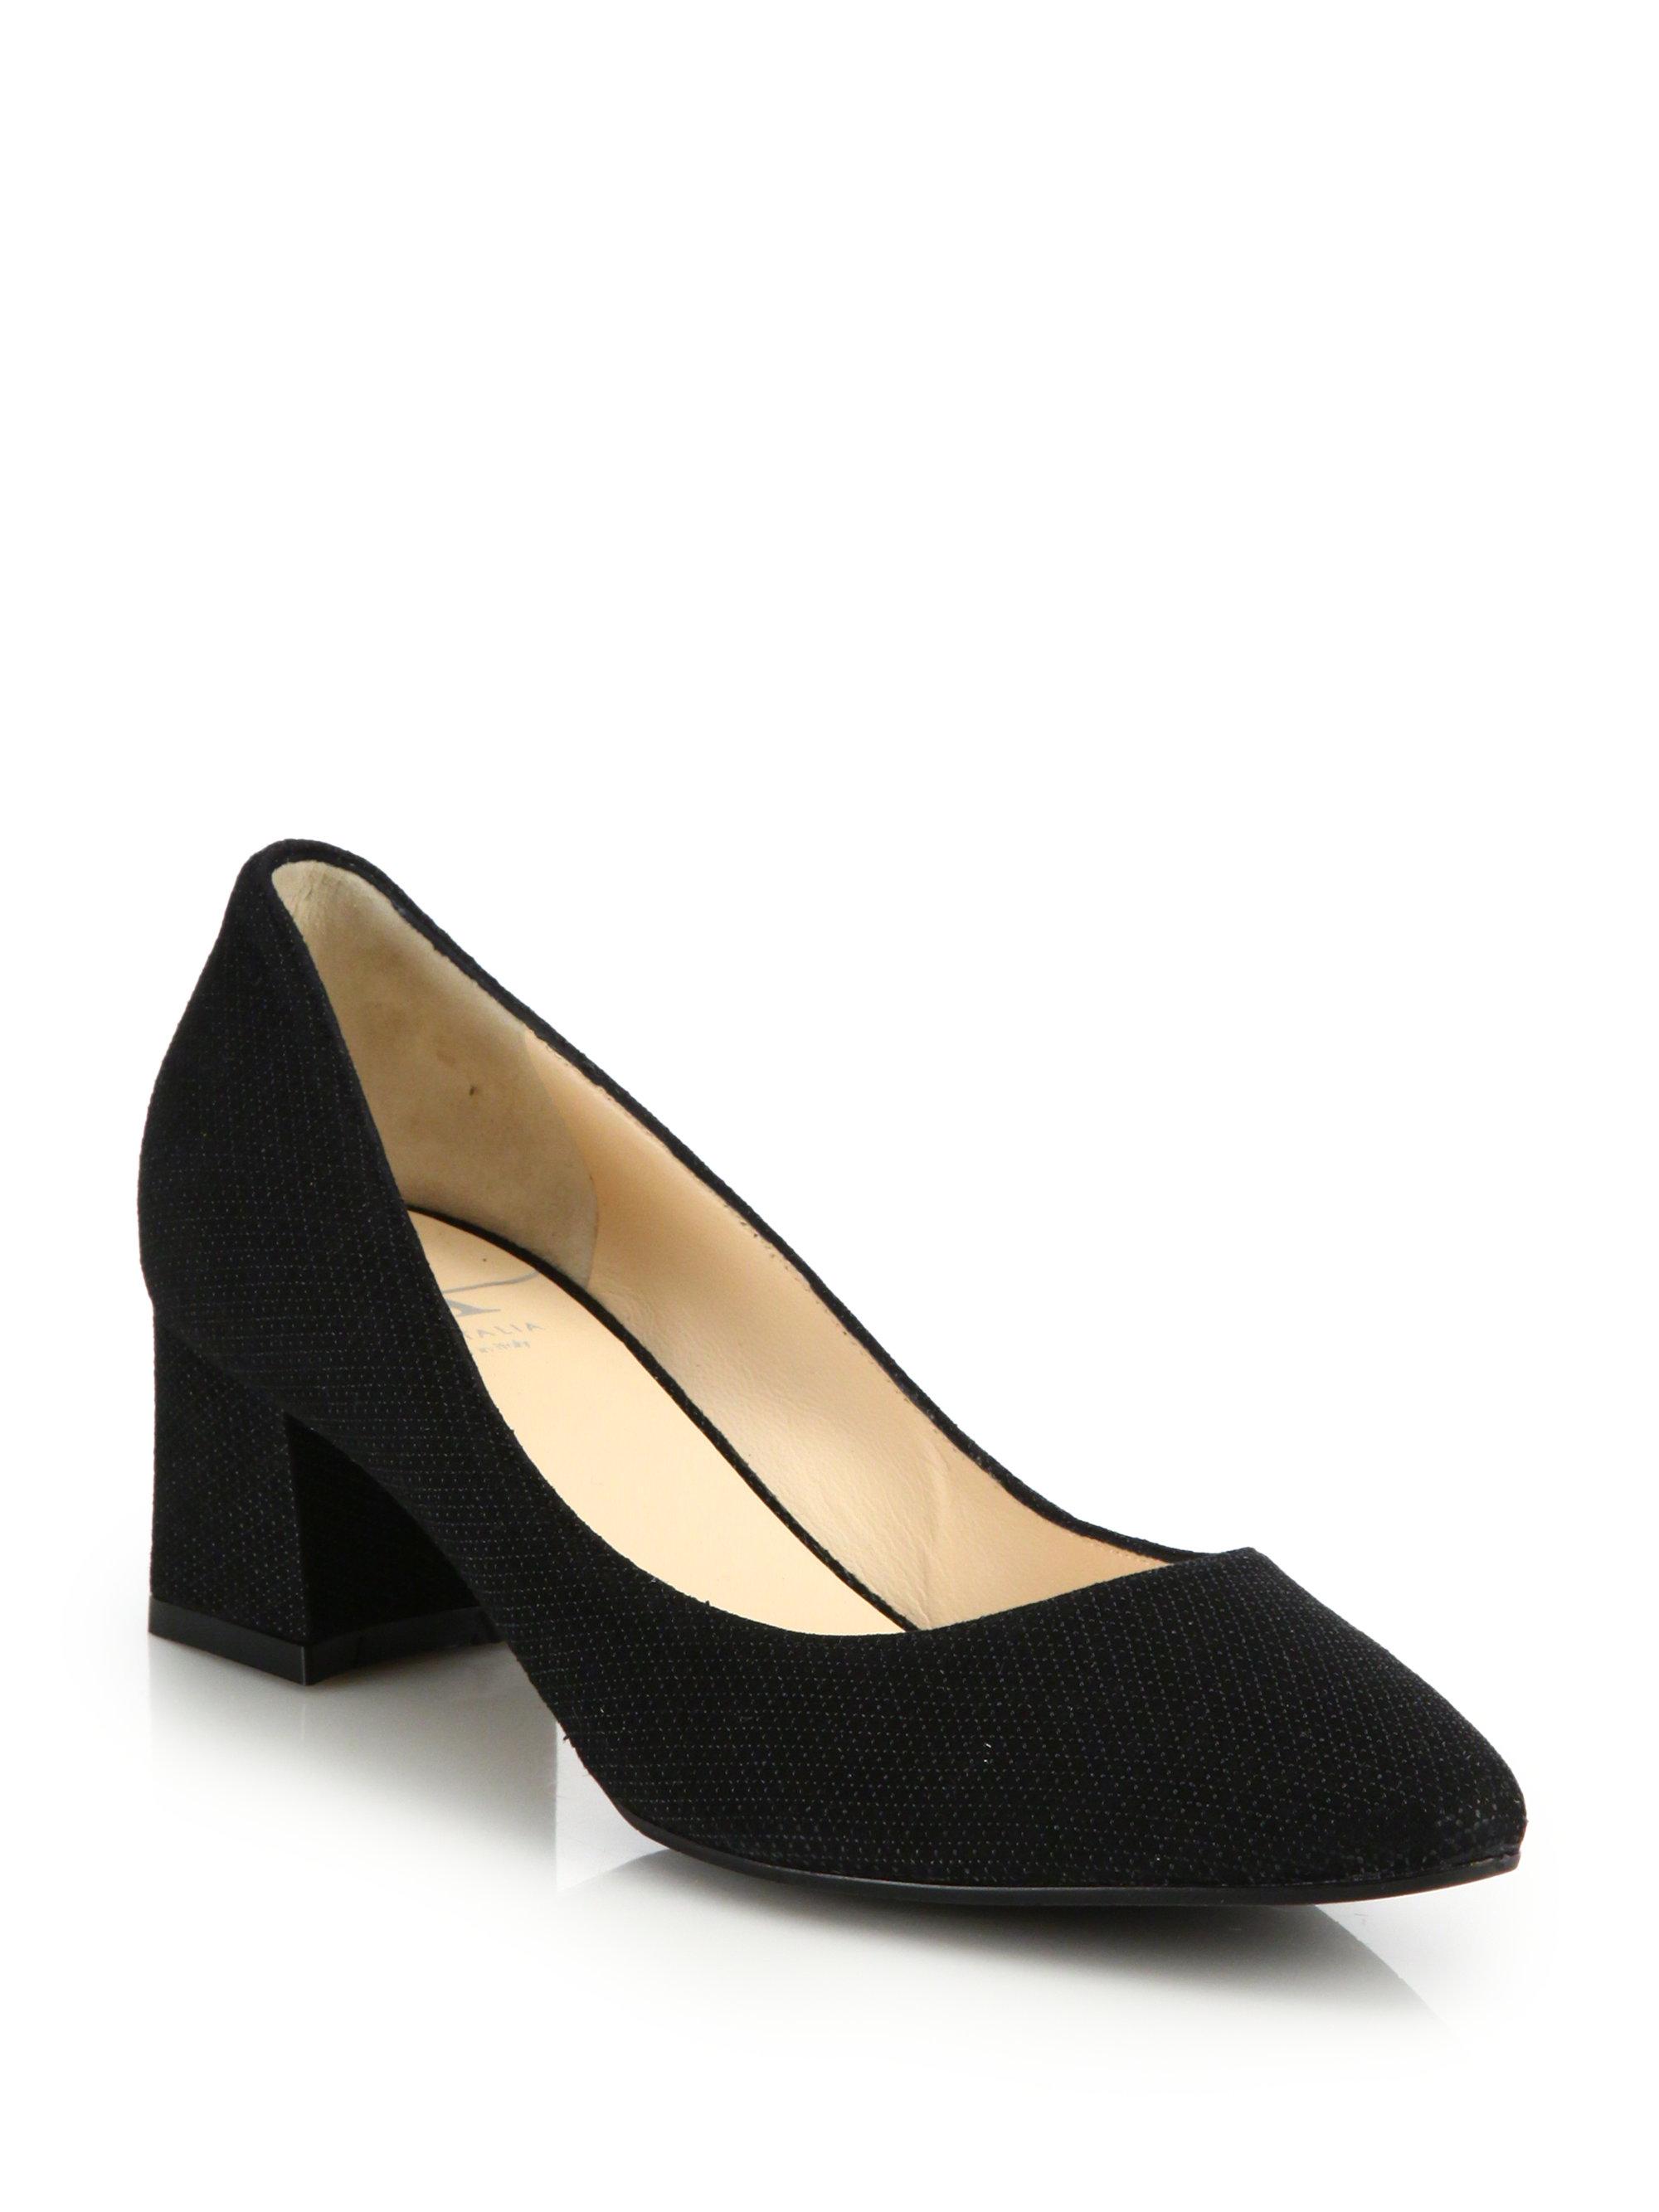 Black leather gloves asos - Aquatalia Phoebe Chunky Heel Leather Pumps In Black Lyst